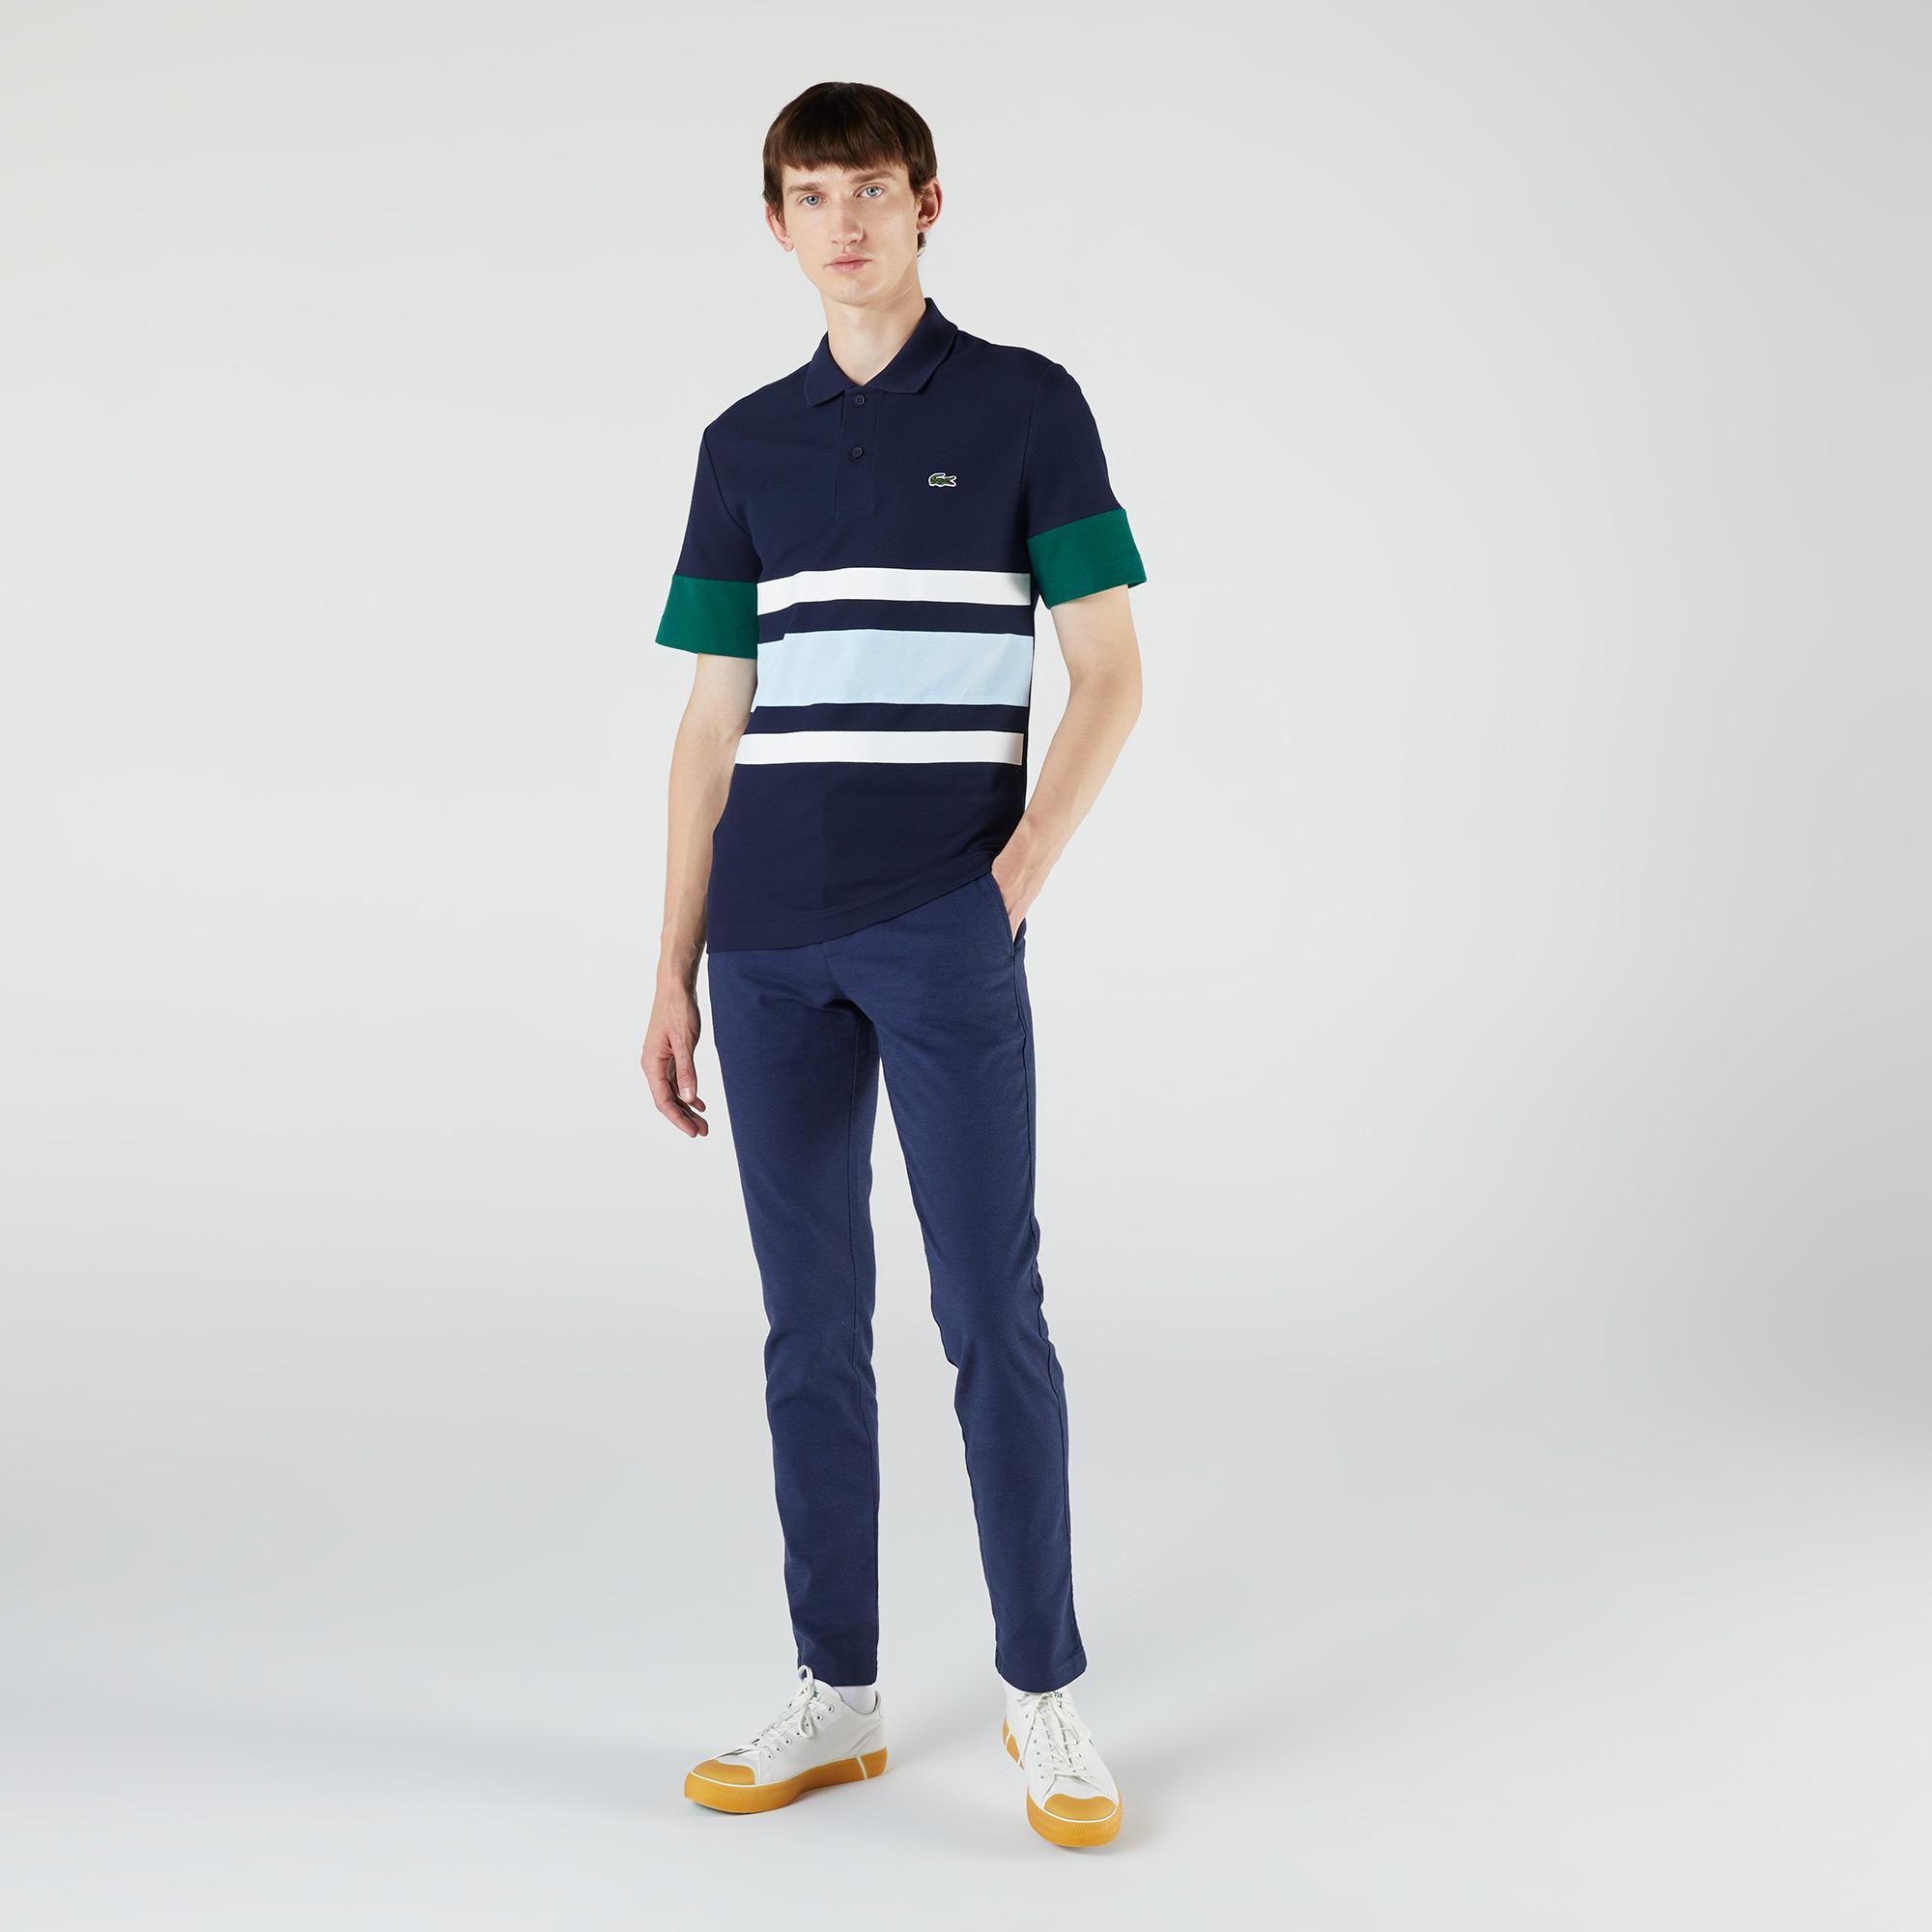 Lacoste Heritage Erkek Slim Fit Renk Bloklu Lacivert Polo